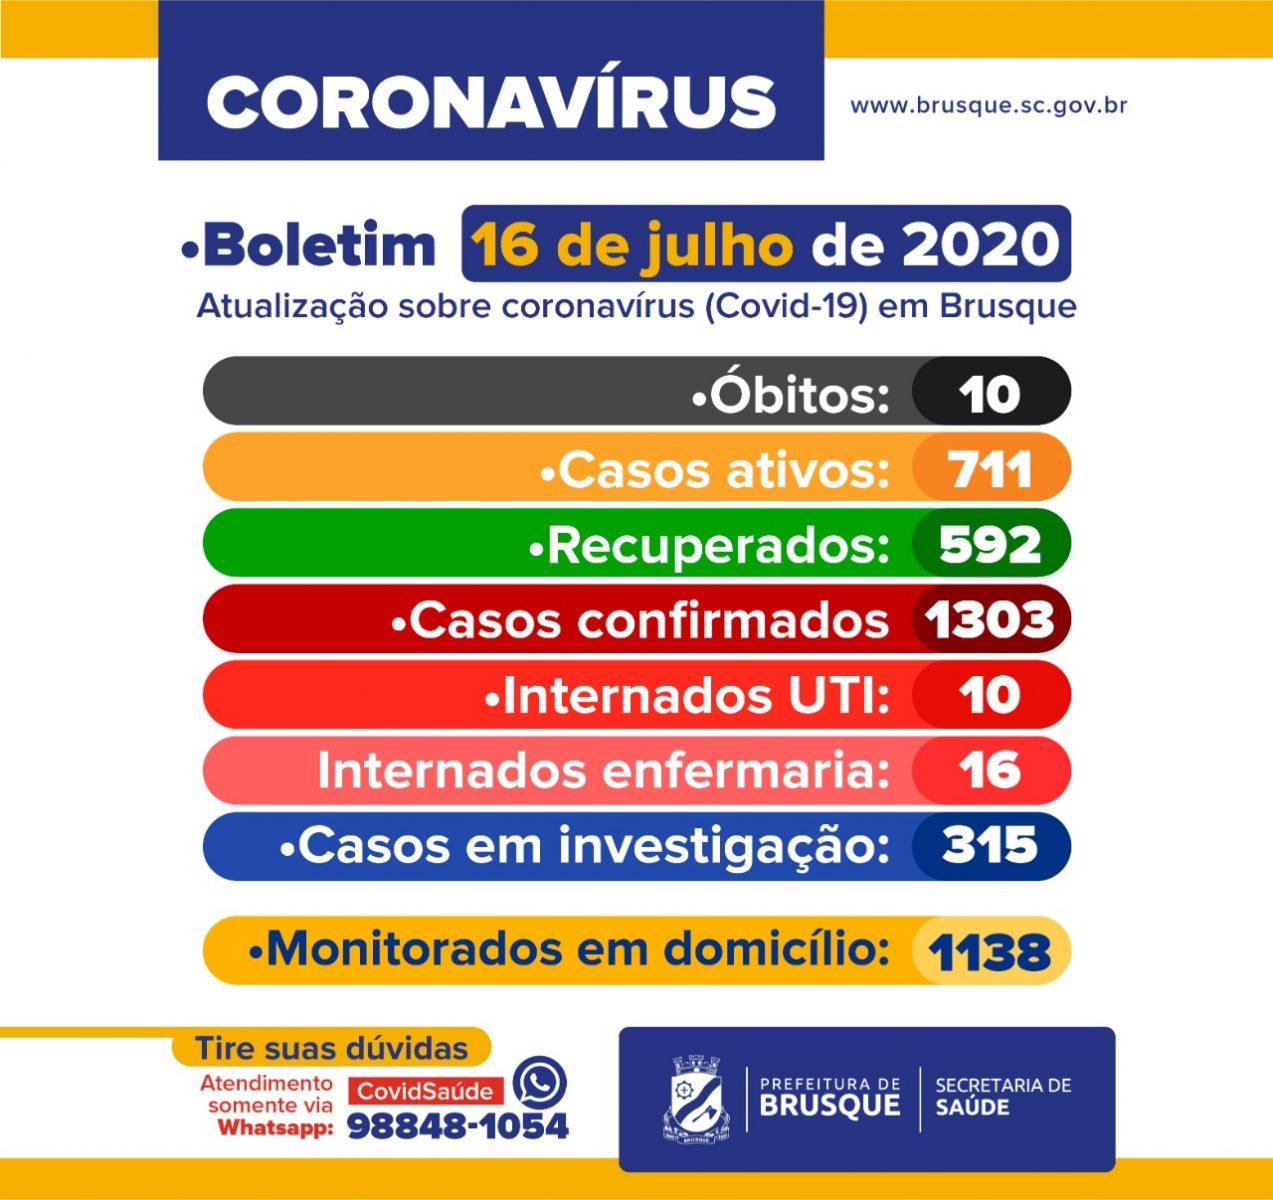 Confira o Boletim Epidemiológico desta quinta-feira (16)